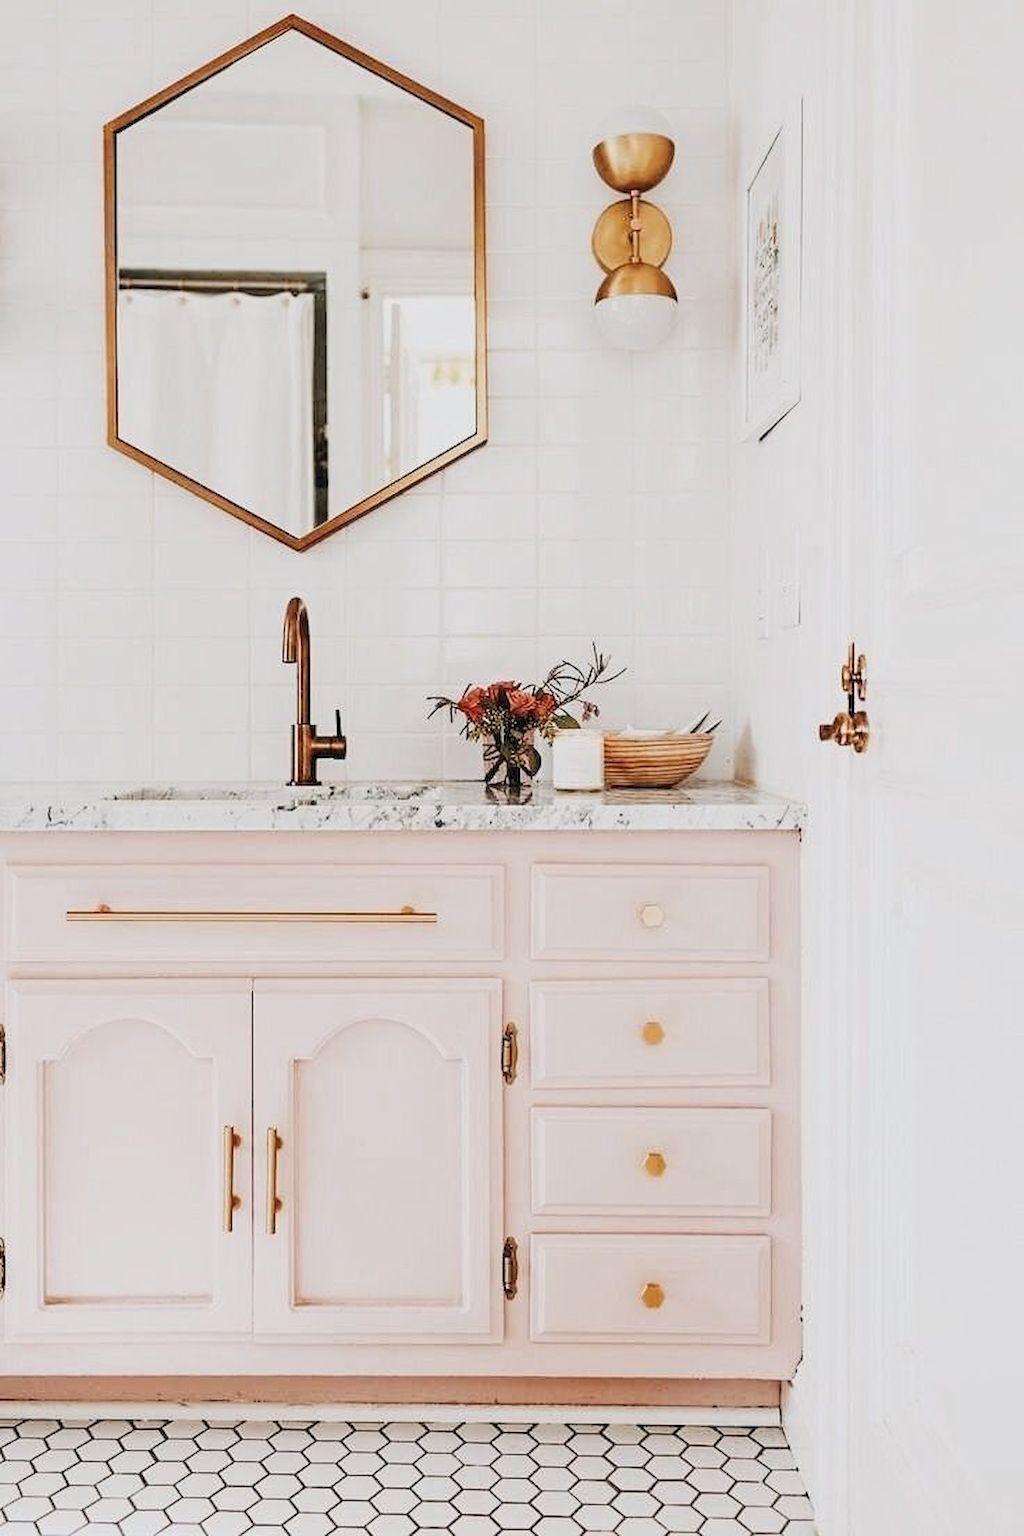 Astounding Stylish Color Scheme For Your Bathroom